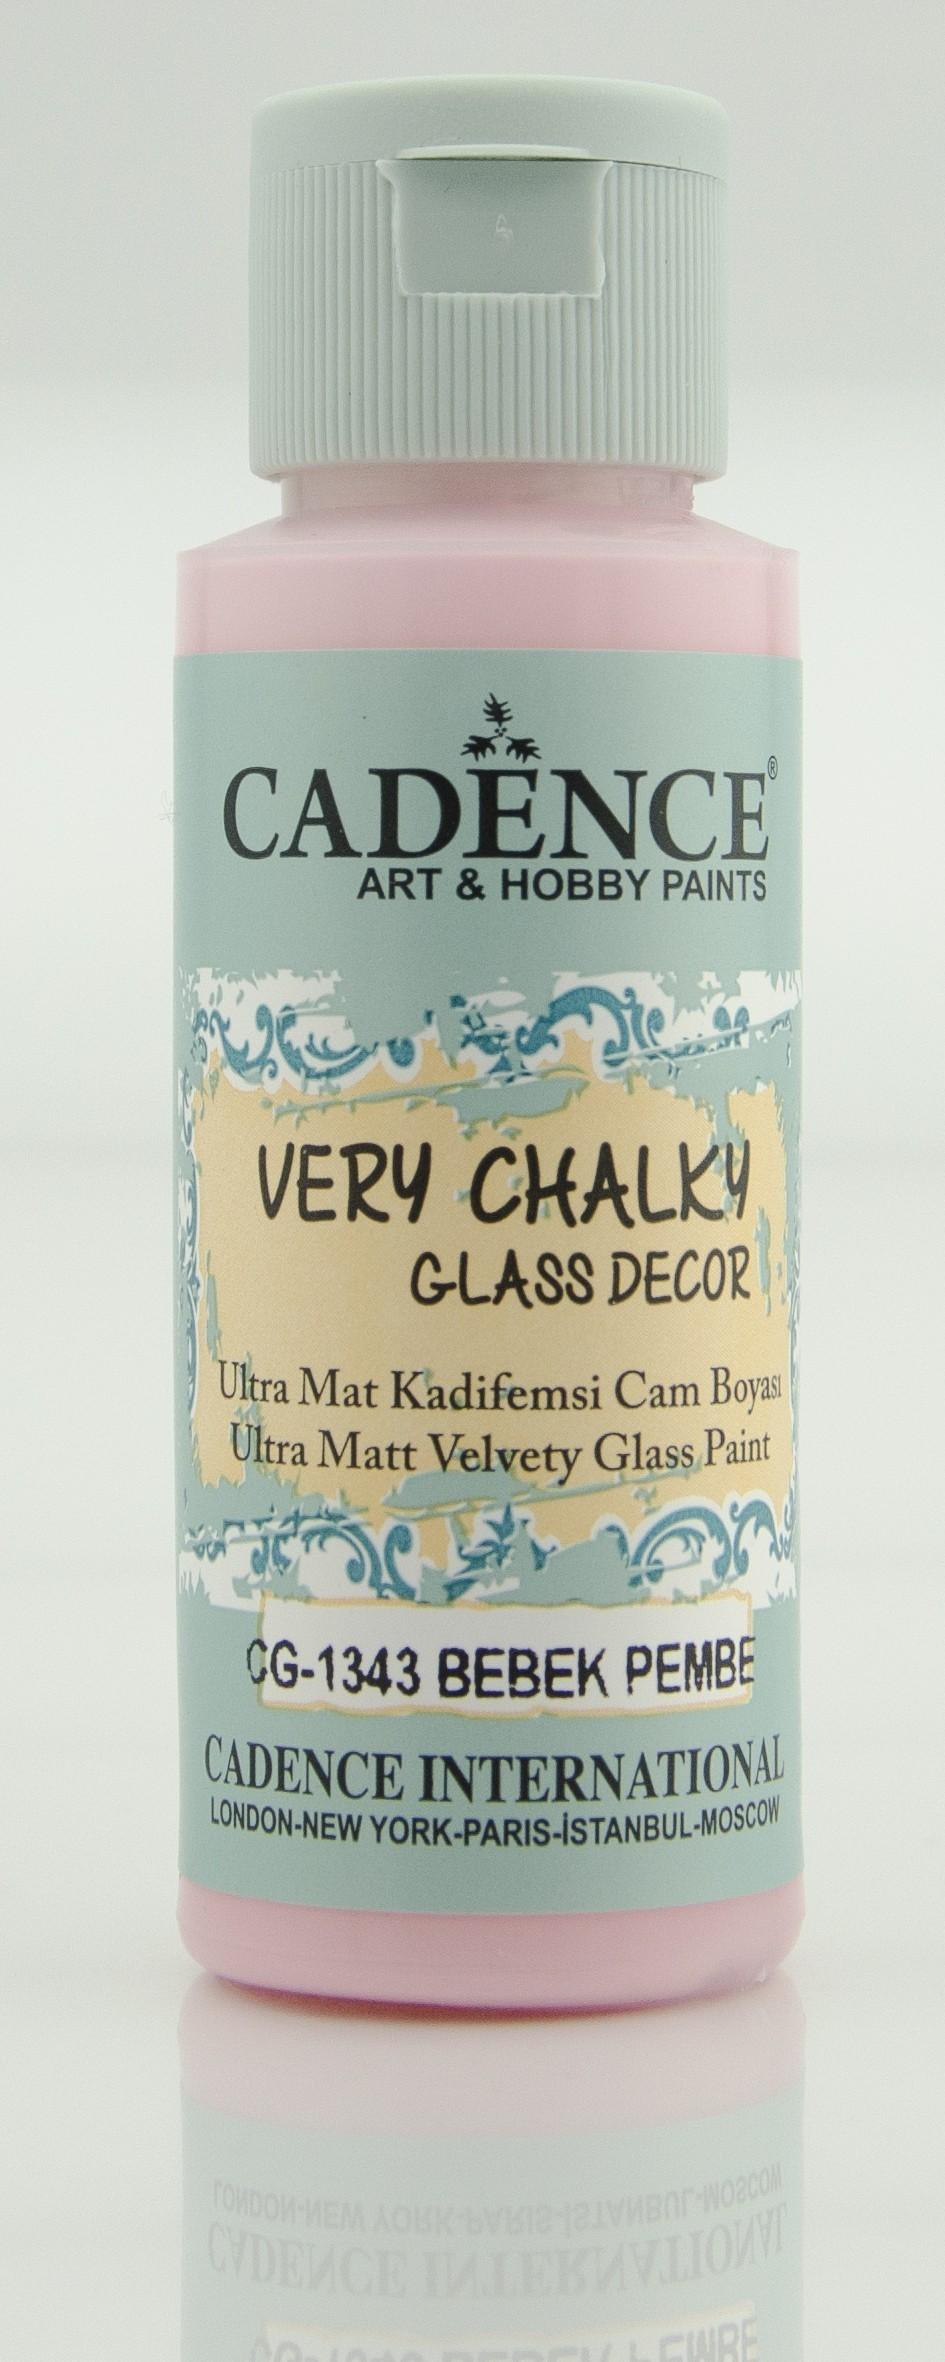 CG1343 Bebek Pembe Very Chalky Cam Boyası